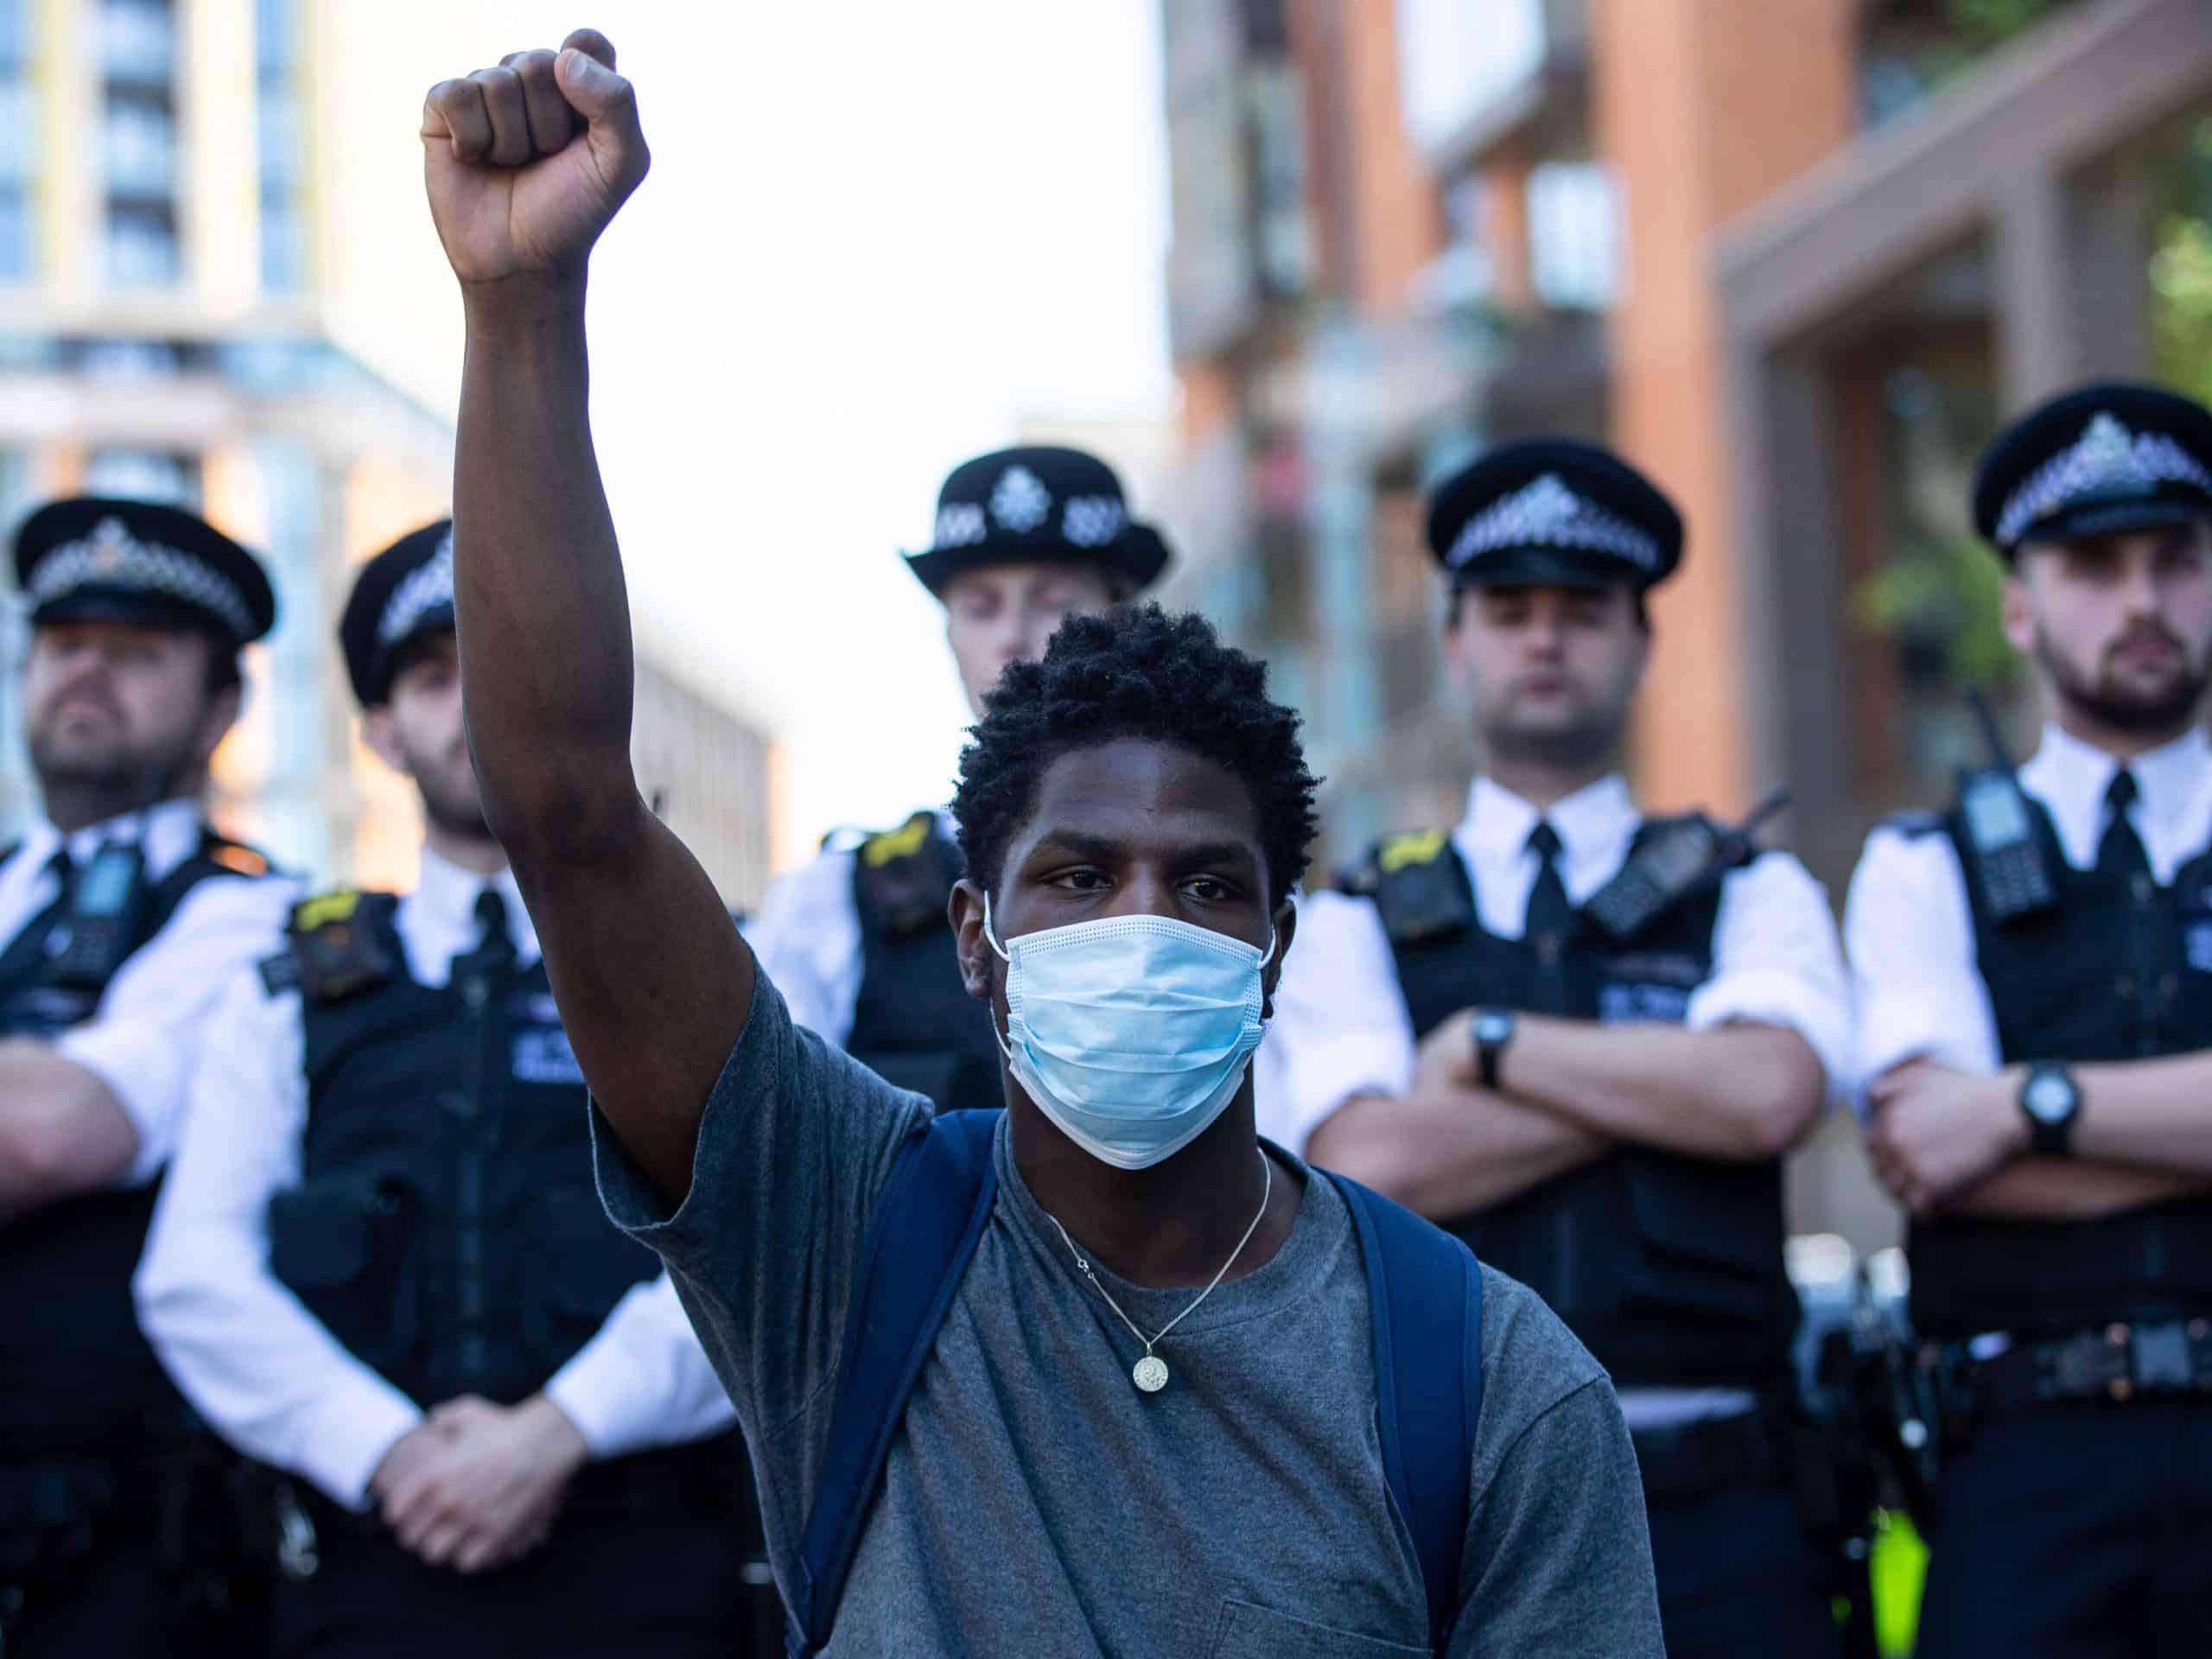 With Biden victory, Black Lives Matter activists hope for police reforms.